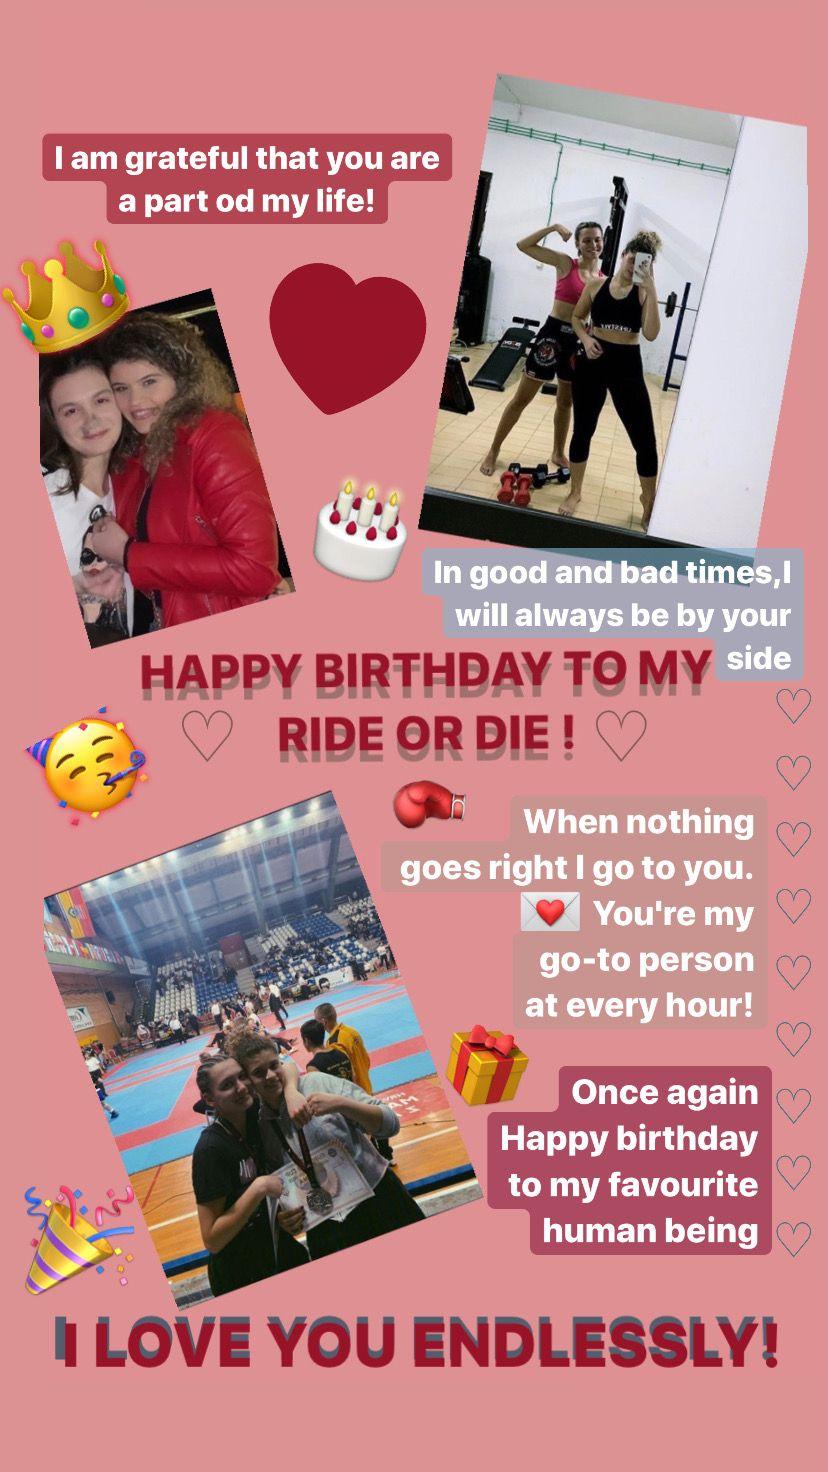 For Best Friend In 2020 Instagram Story Ideas My Ride Or Die